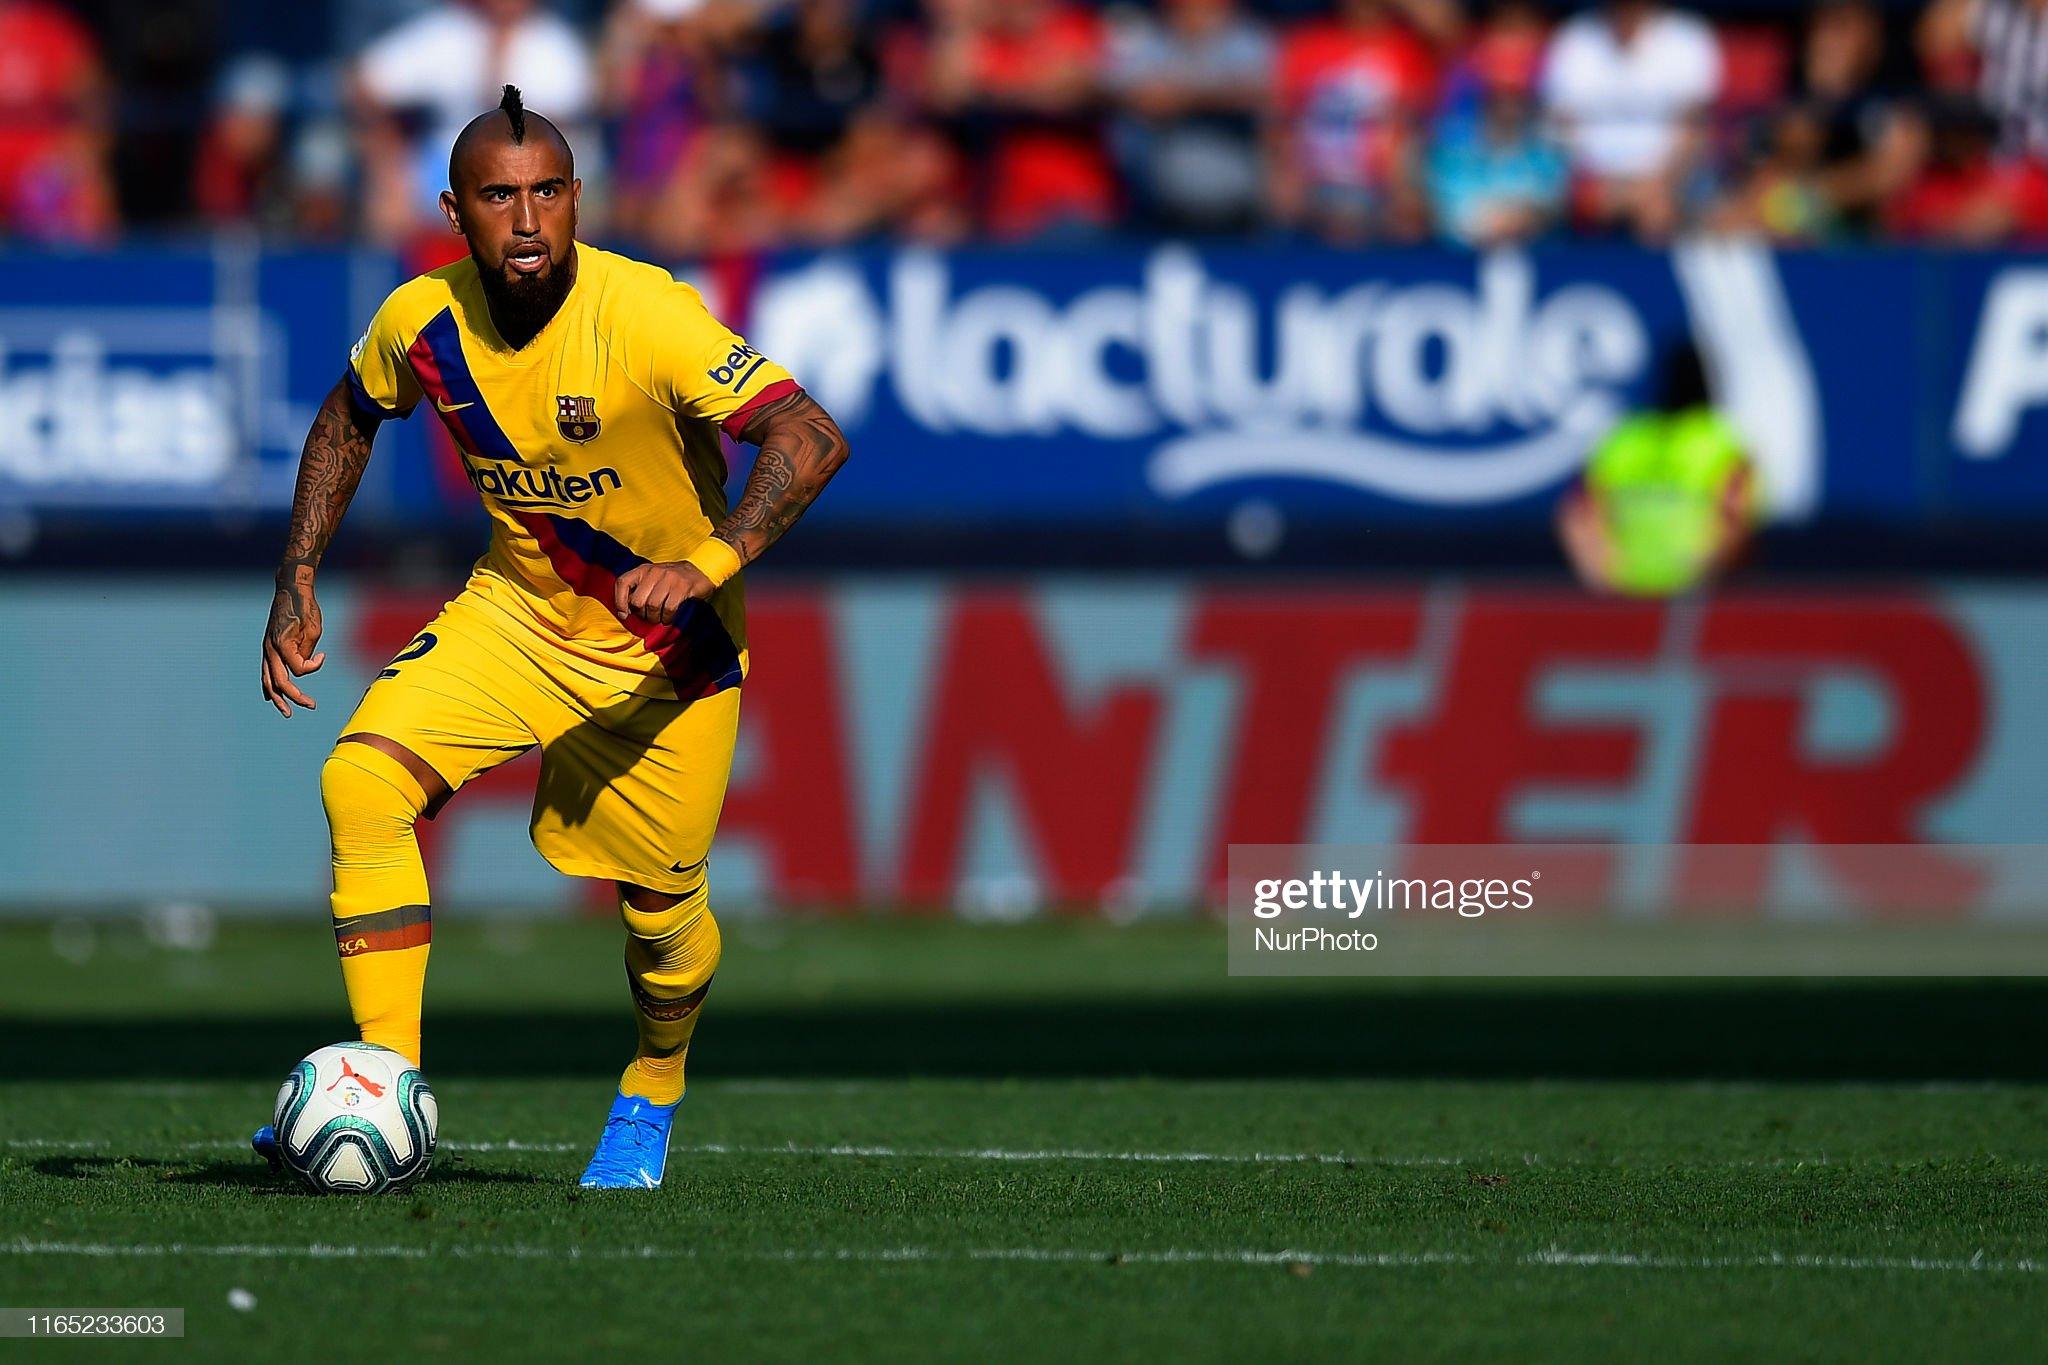 صور مباراة : أوساسونا - برشلونة 2-2 ( 31-08-2019 )  Arturo-vidal-of-barcelona-controls-the-ball-during-the-liga-match-ca-picture-id1165233603?s=2048x2048